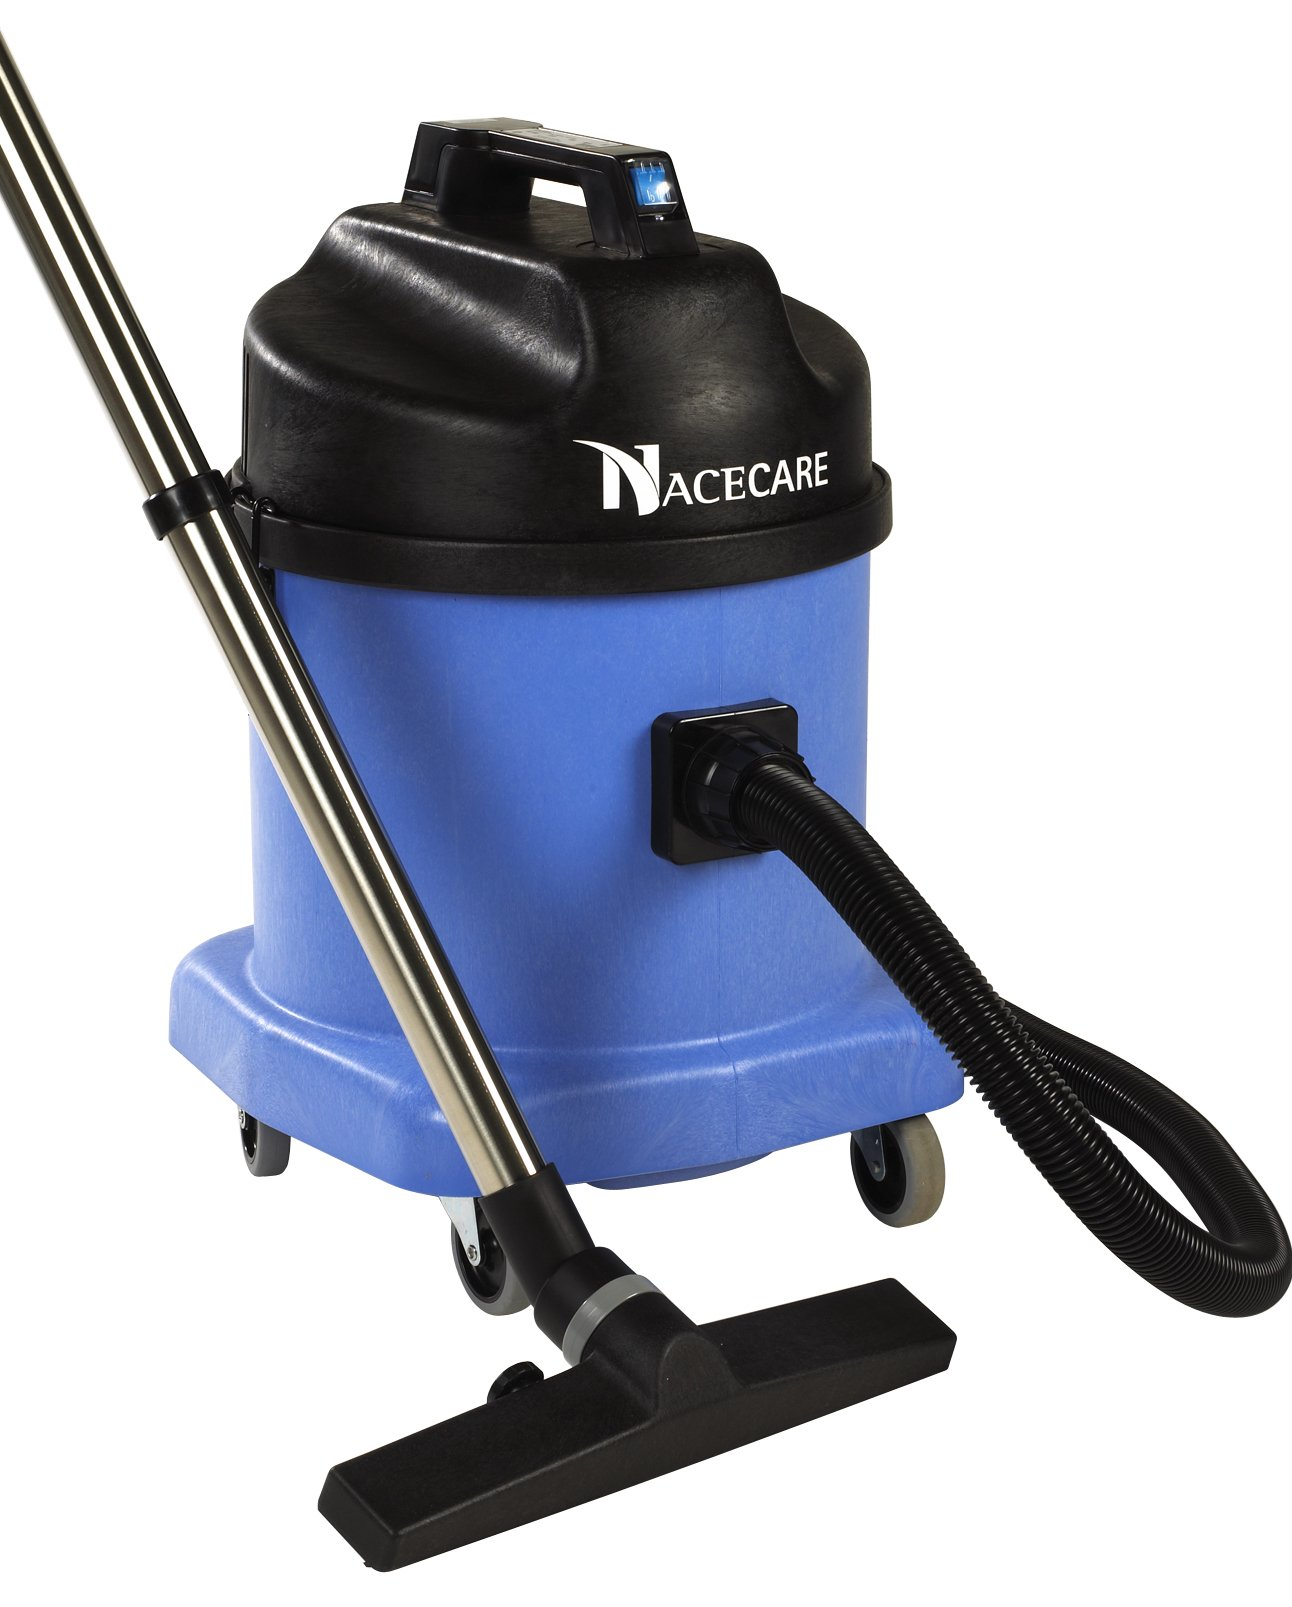 NaceCare WV570 Wet/Dry Vacuum with BB8 Kit, 6 Gallon Tank Capacity, 1200W Vacuum Motor, 1.6 HP